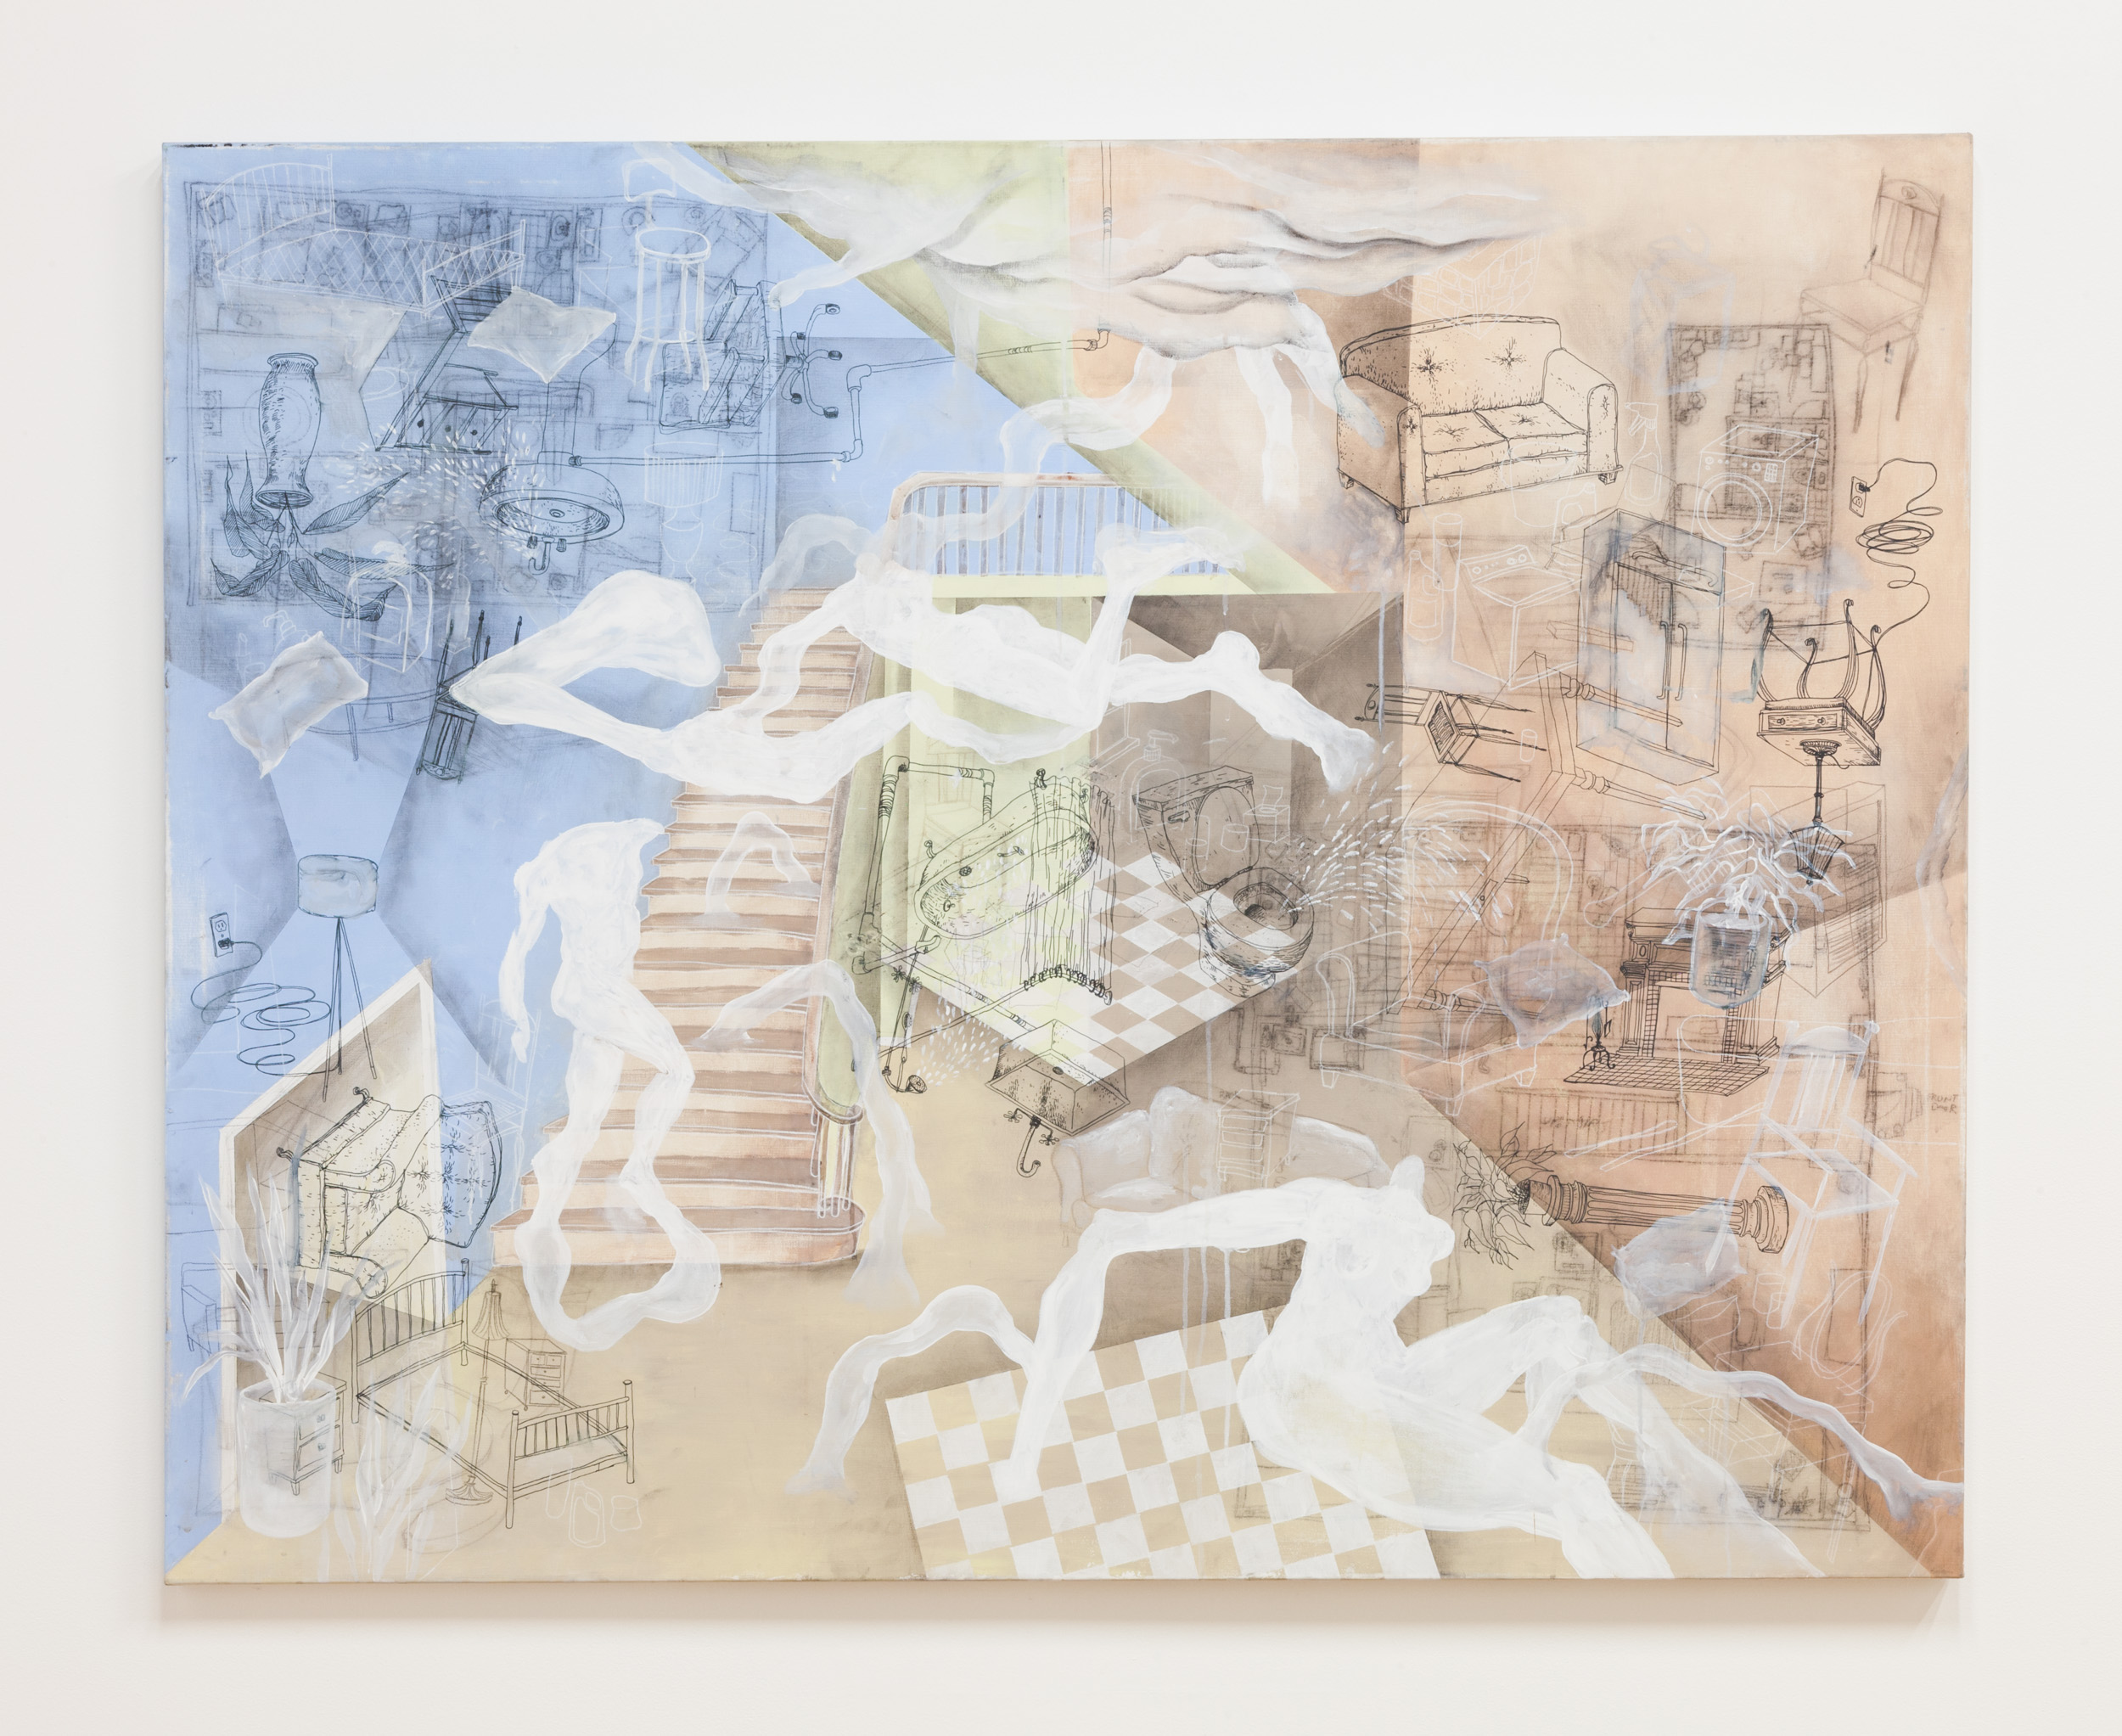 Sarah Wilson  Floorplan ,2017 acrylic, ink, charcoal, watercolor on canvas 60 x 48 in.